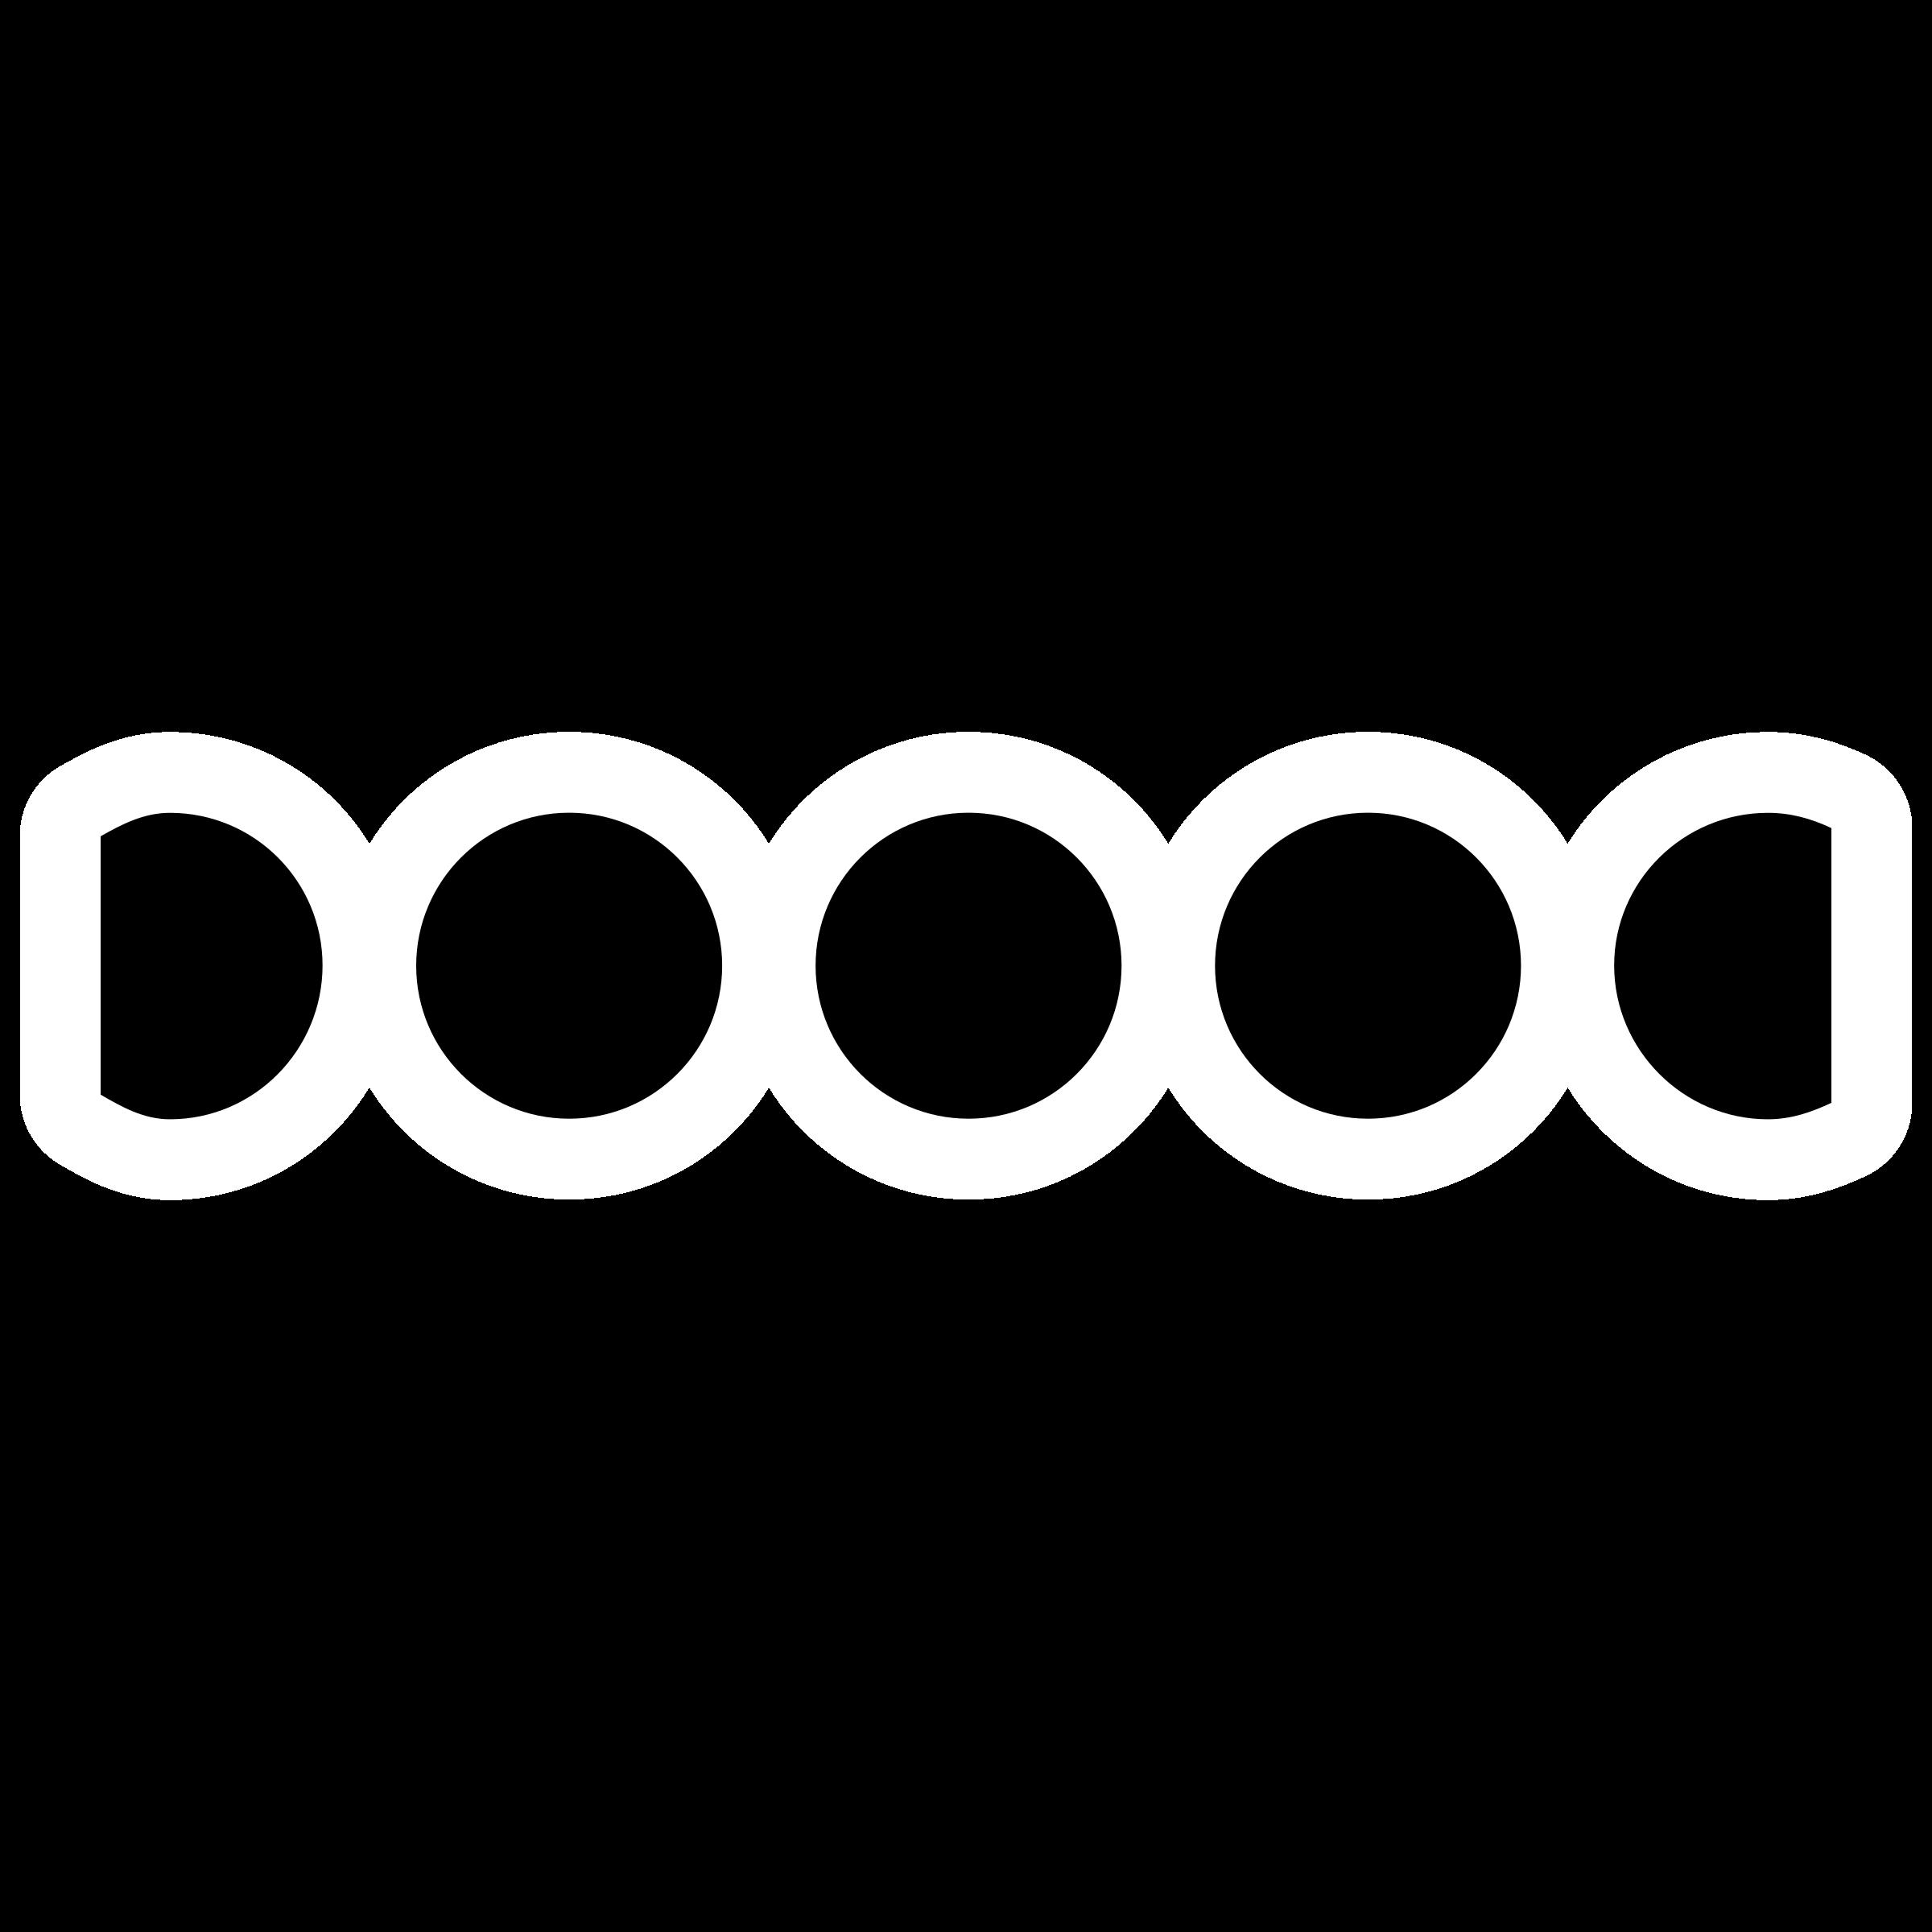 Black Dot Clip Art. BIG IMAGE (PNG)